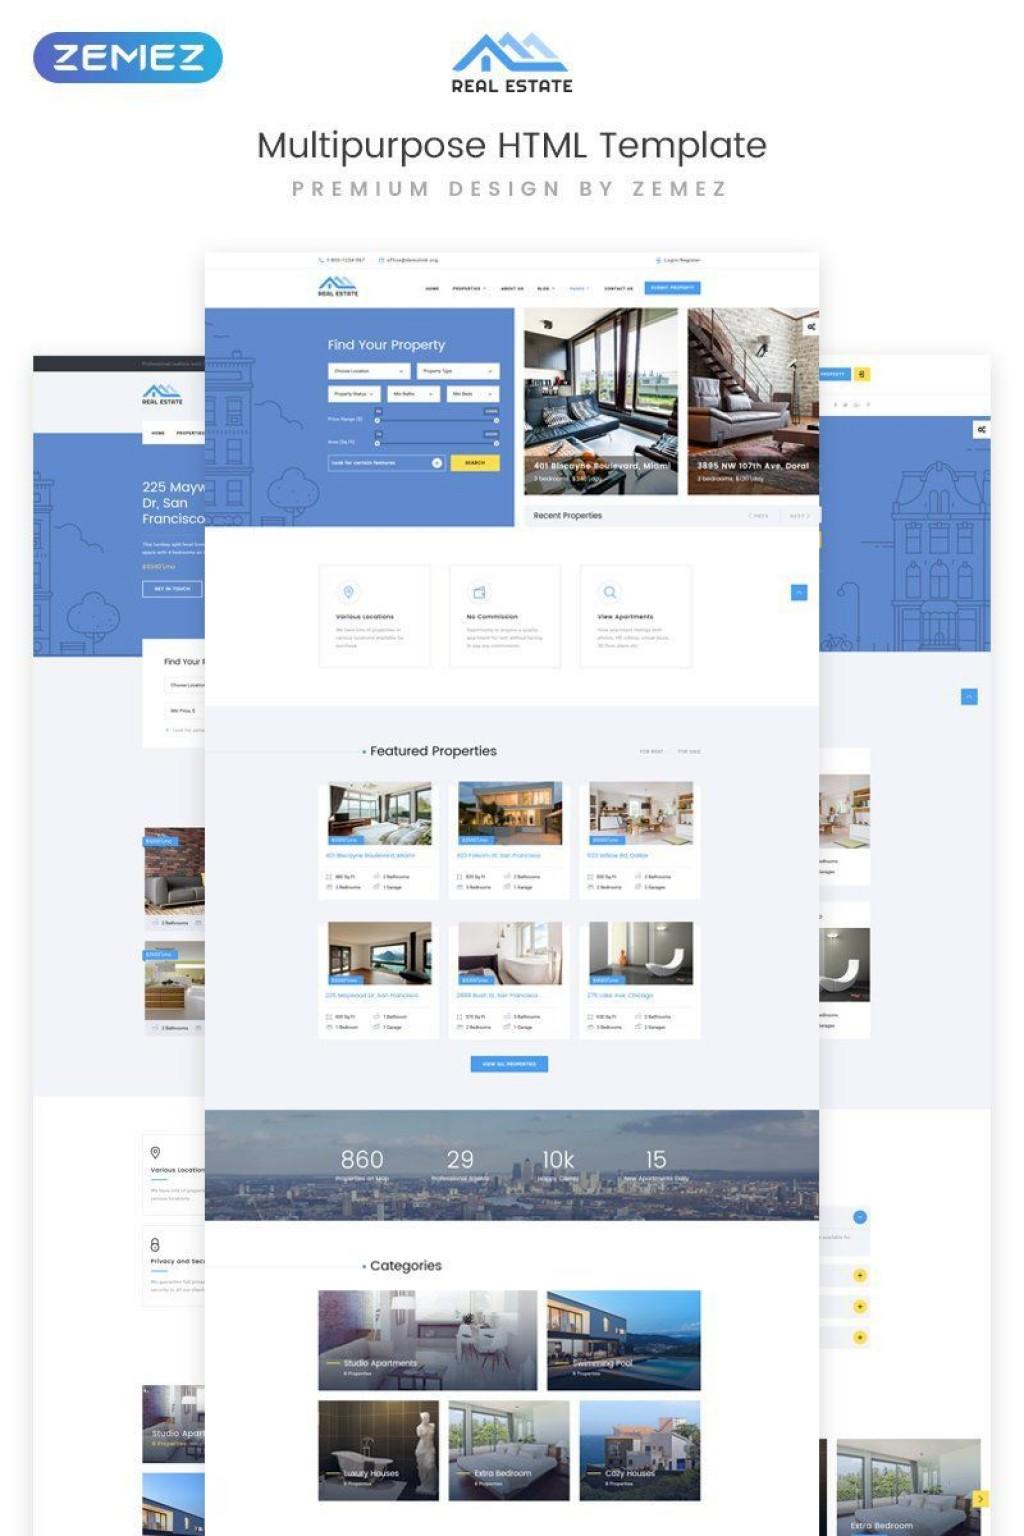 004 Fantastic Real Estate Website Template Inspiration  Templates Bootstrap Free Html5 Best WordpresLarge